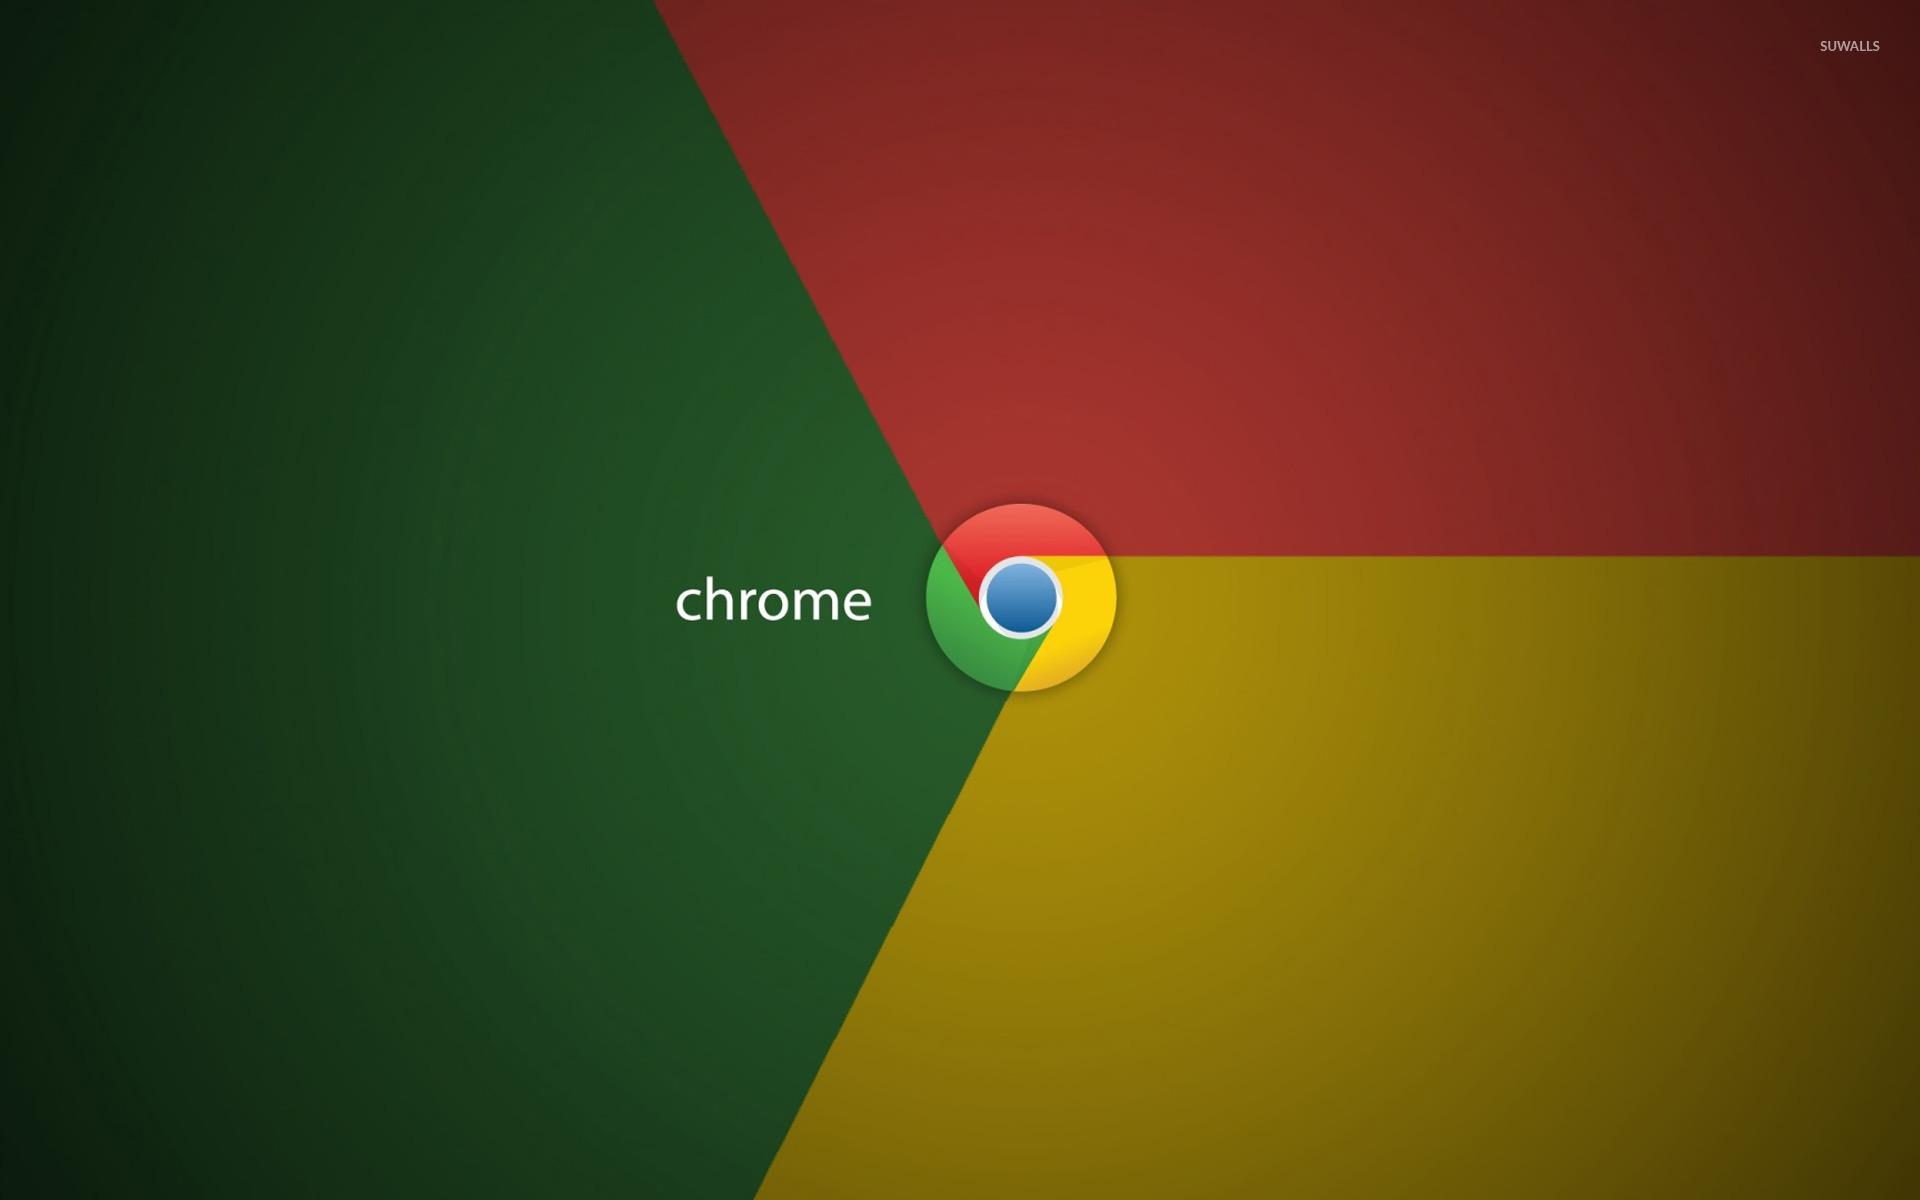 how to delete wallpaper on google chrome